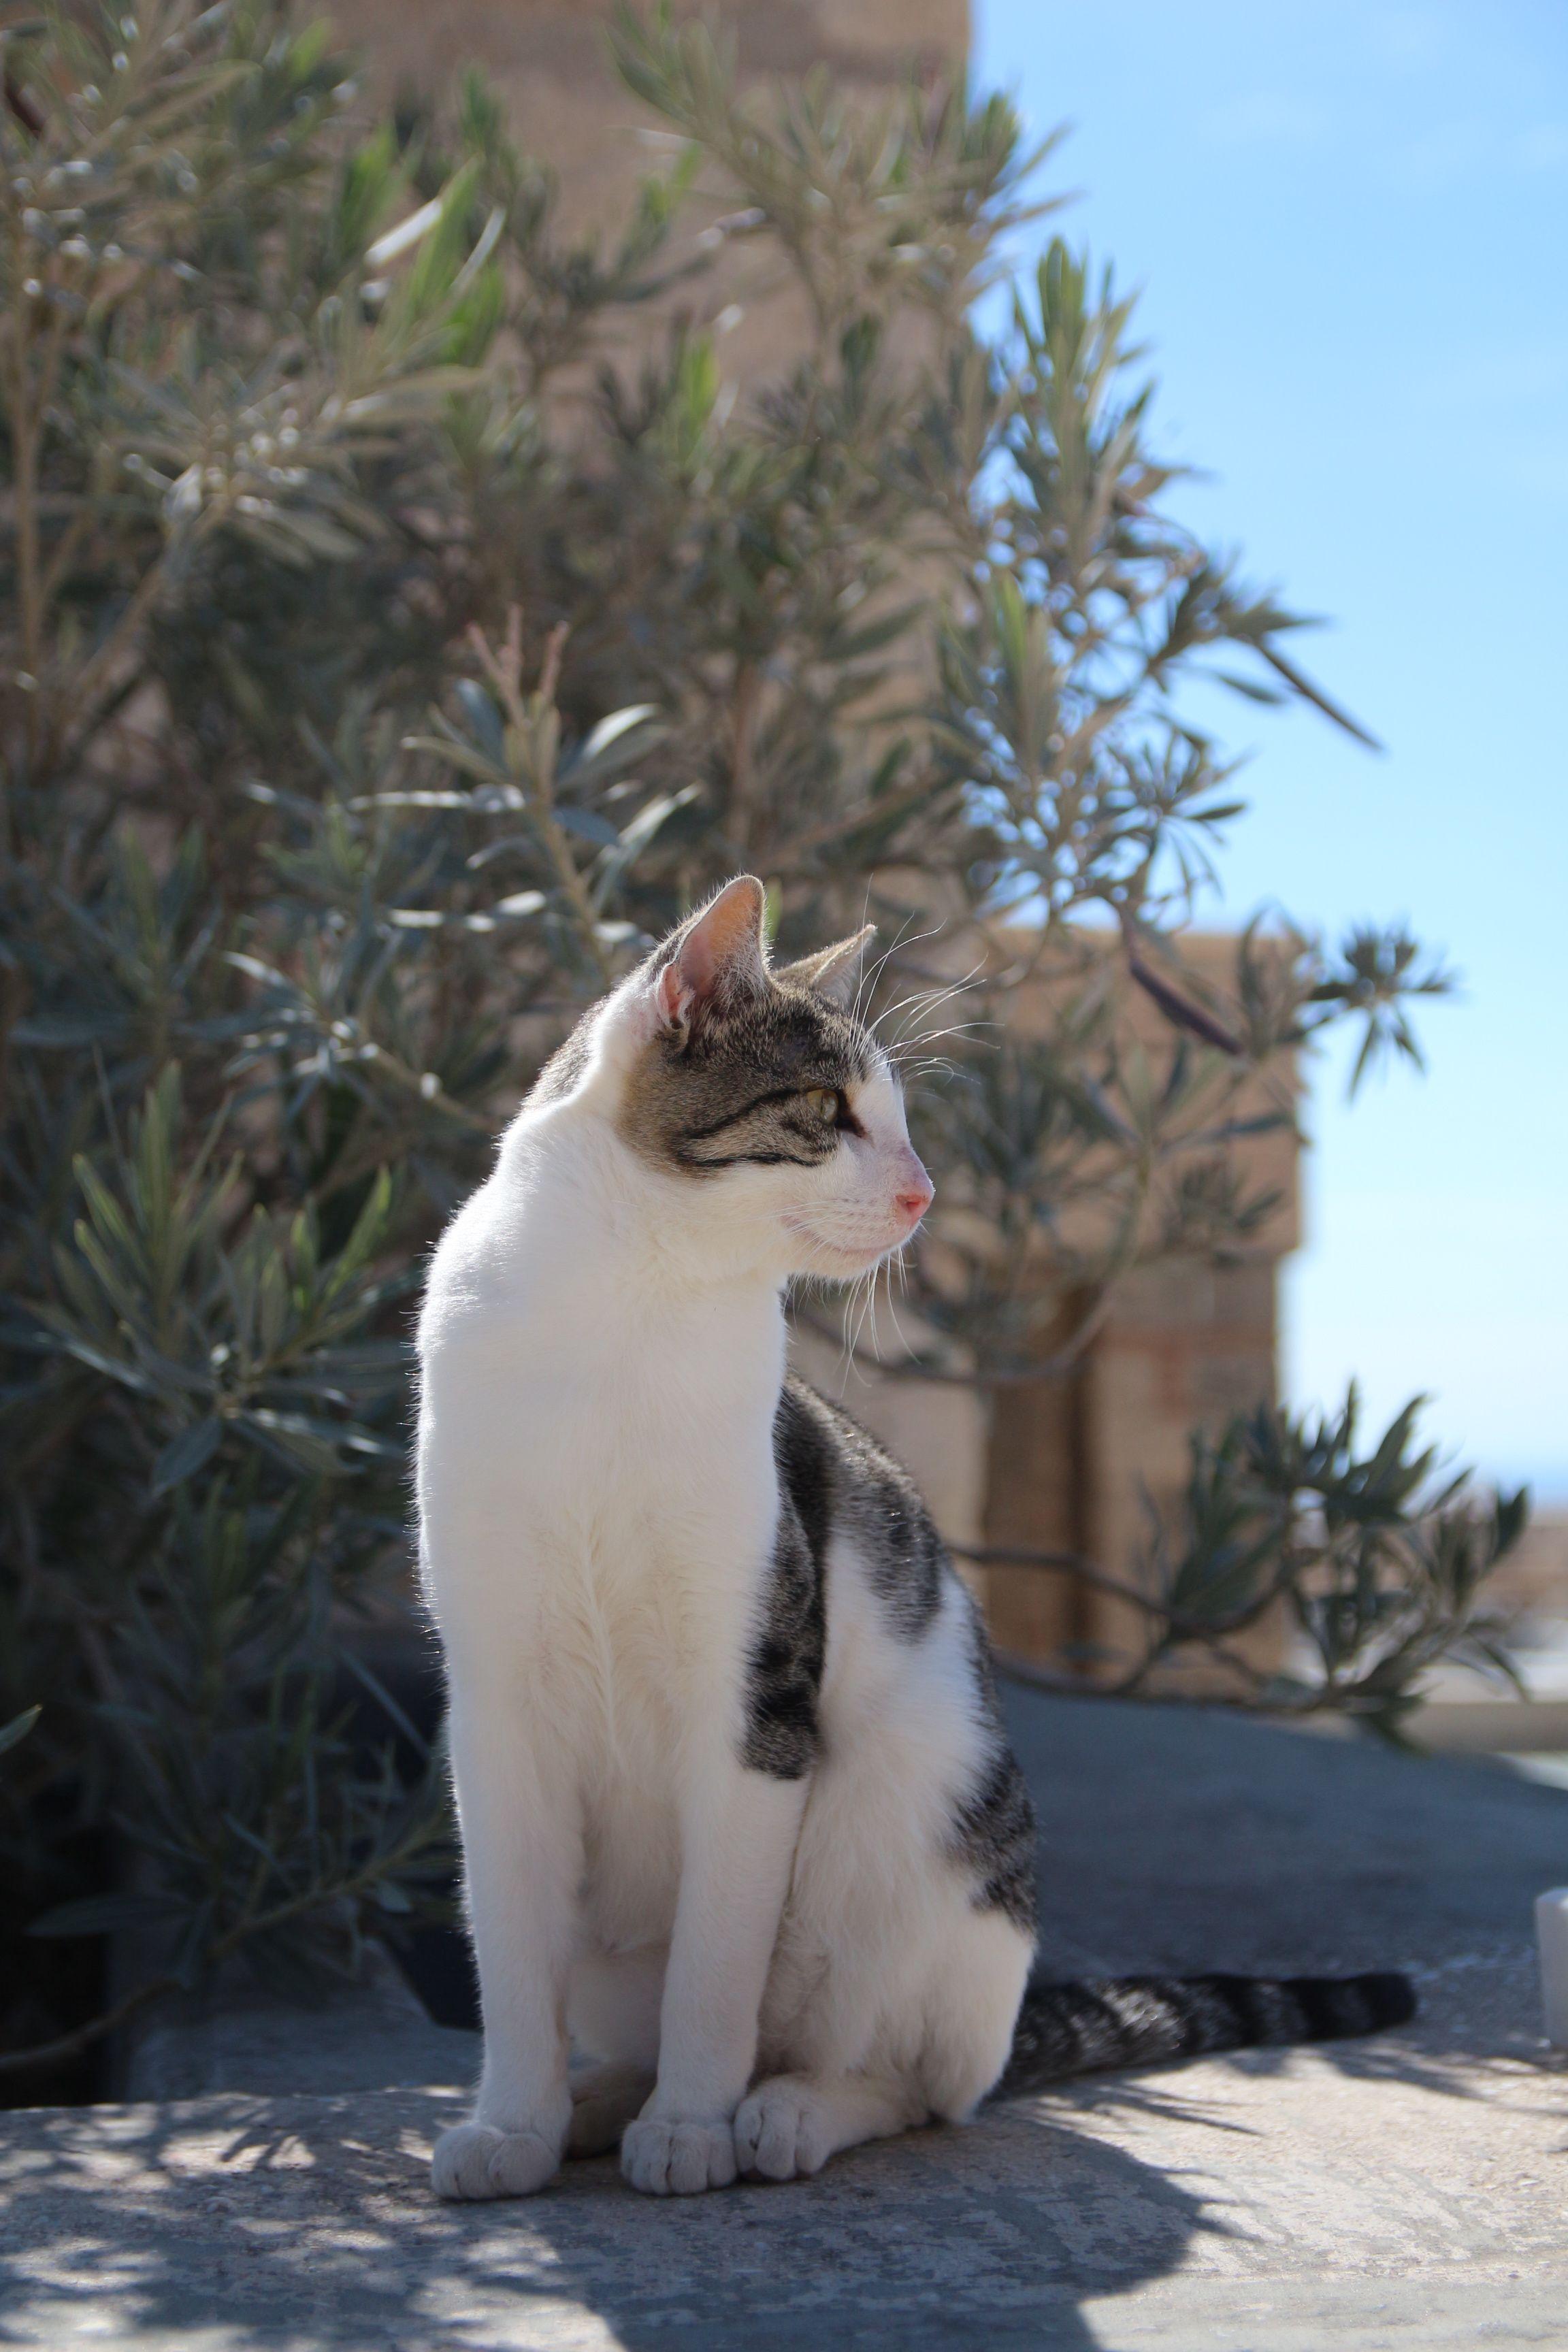 cat straycat at Athens アテネ 野良猫